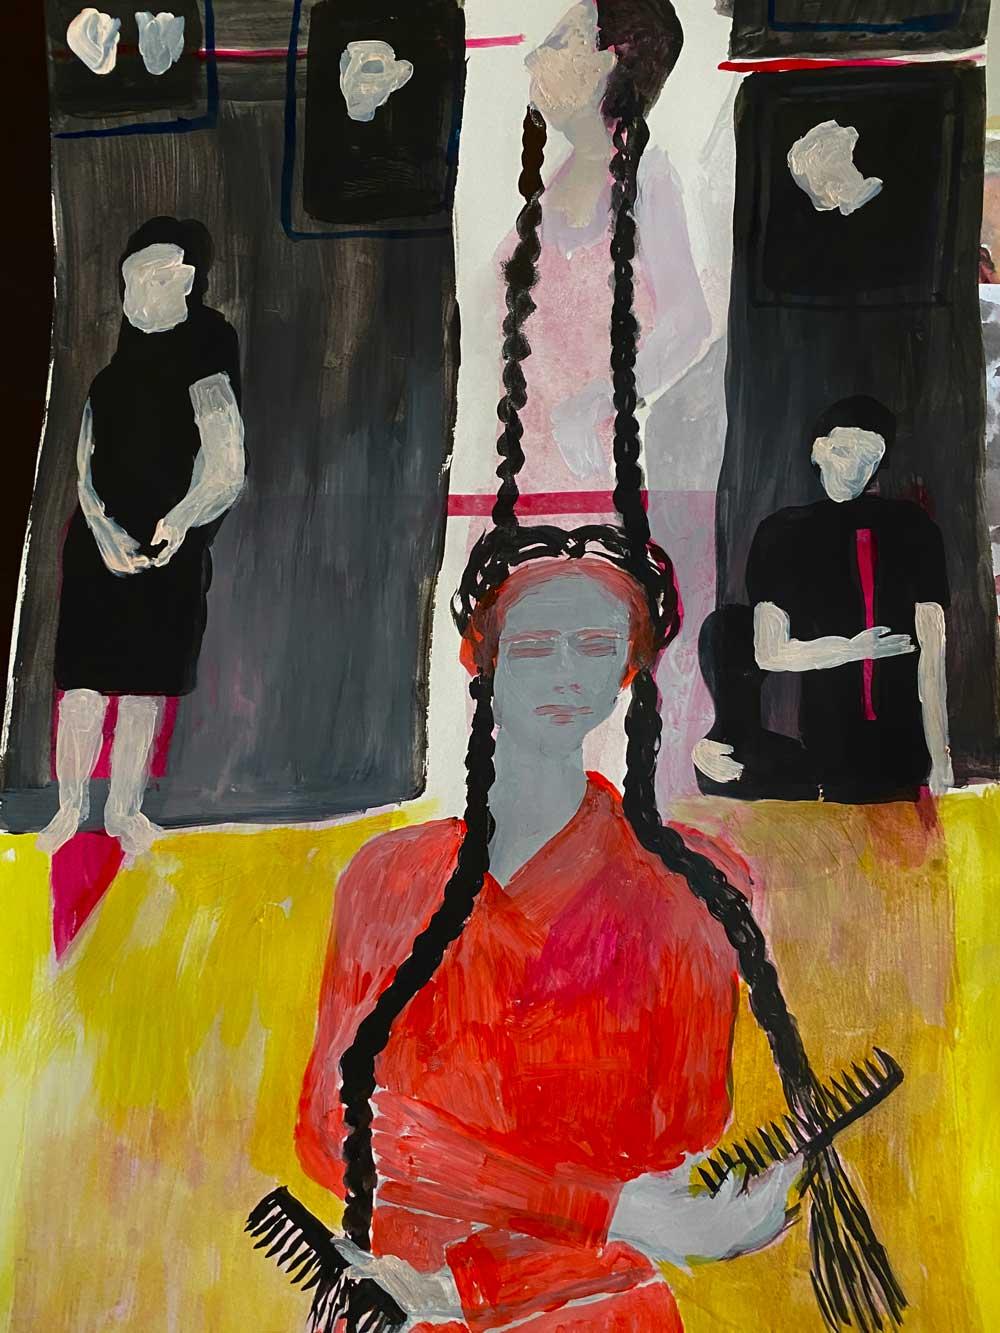 Nereida Garcia Ferraz, GIrls with Braids artwork